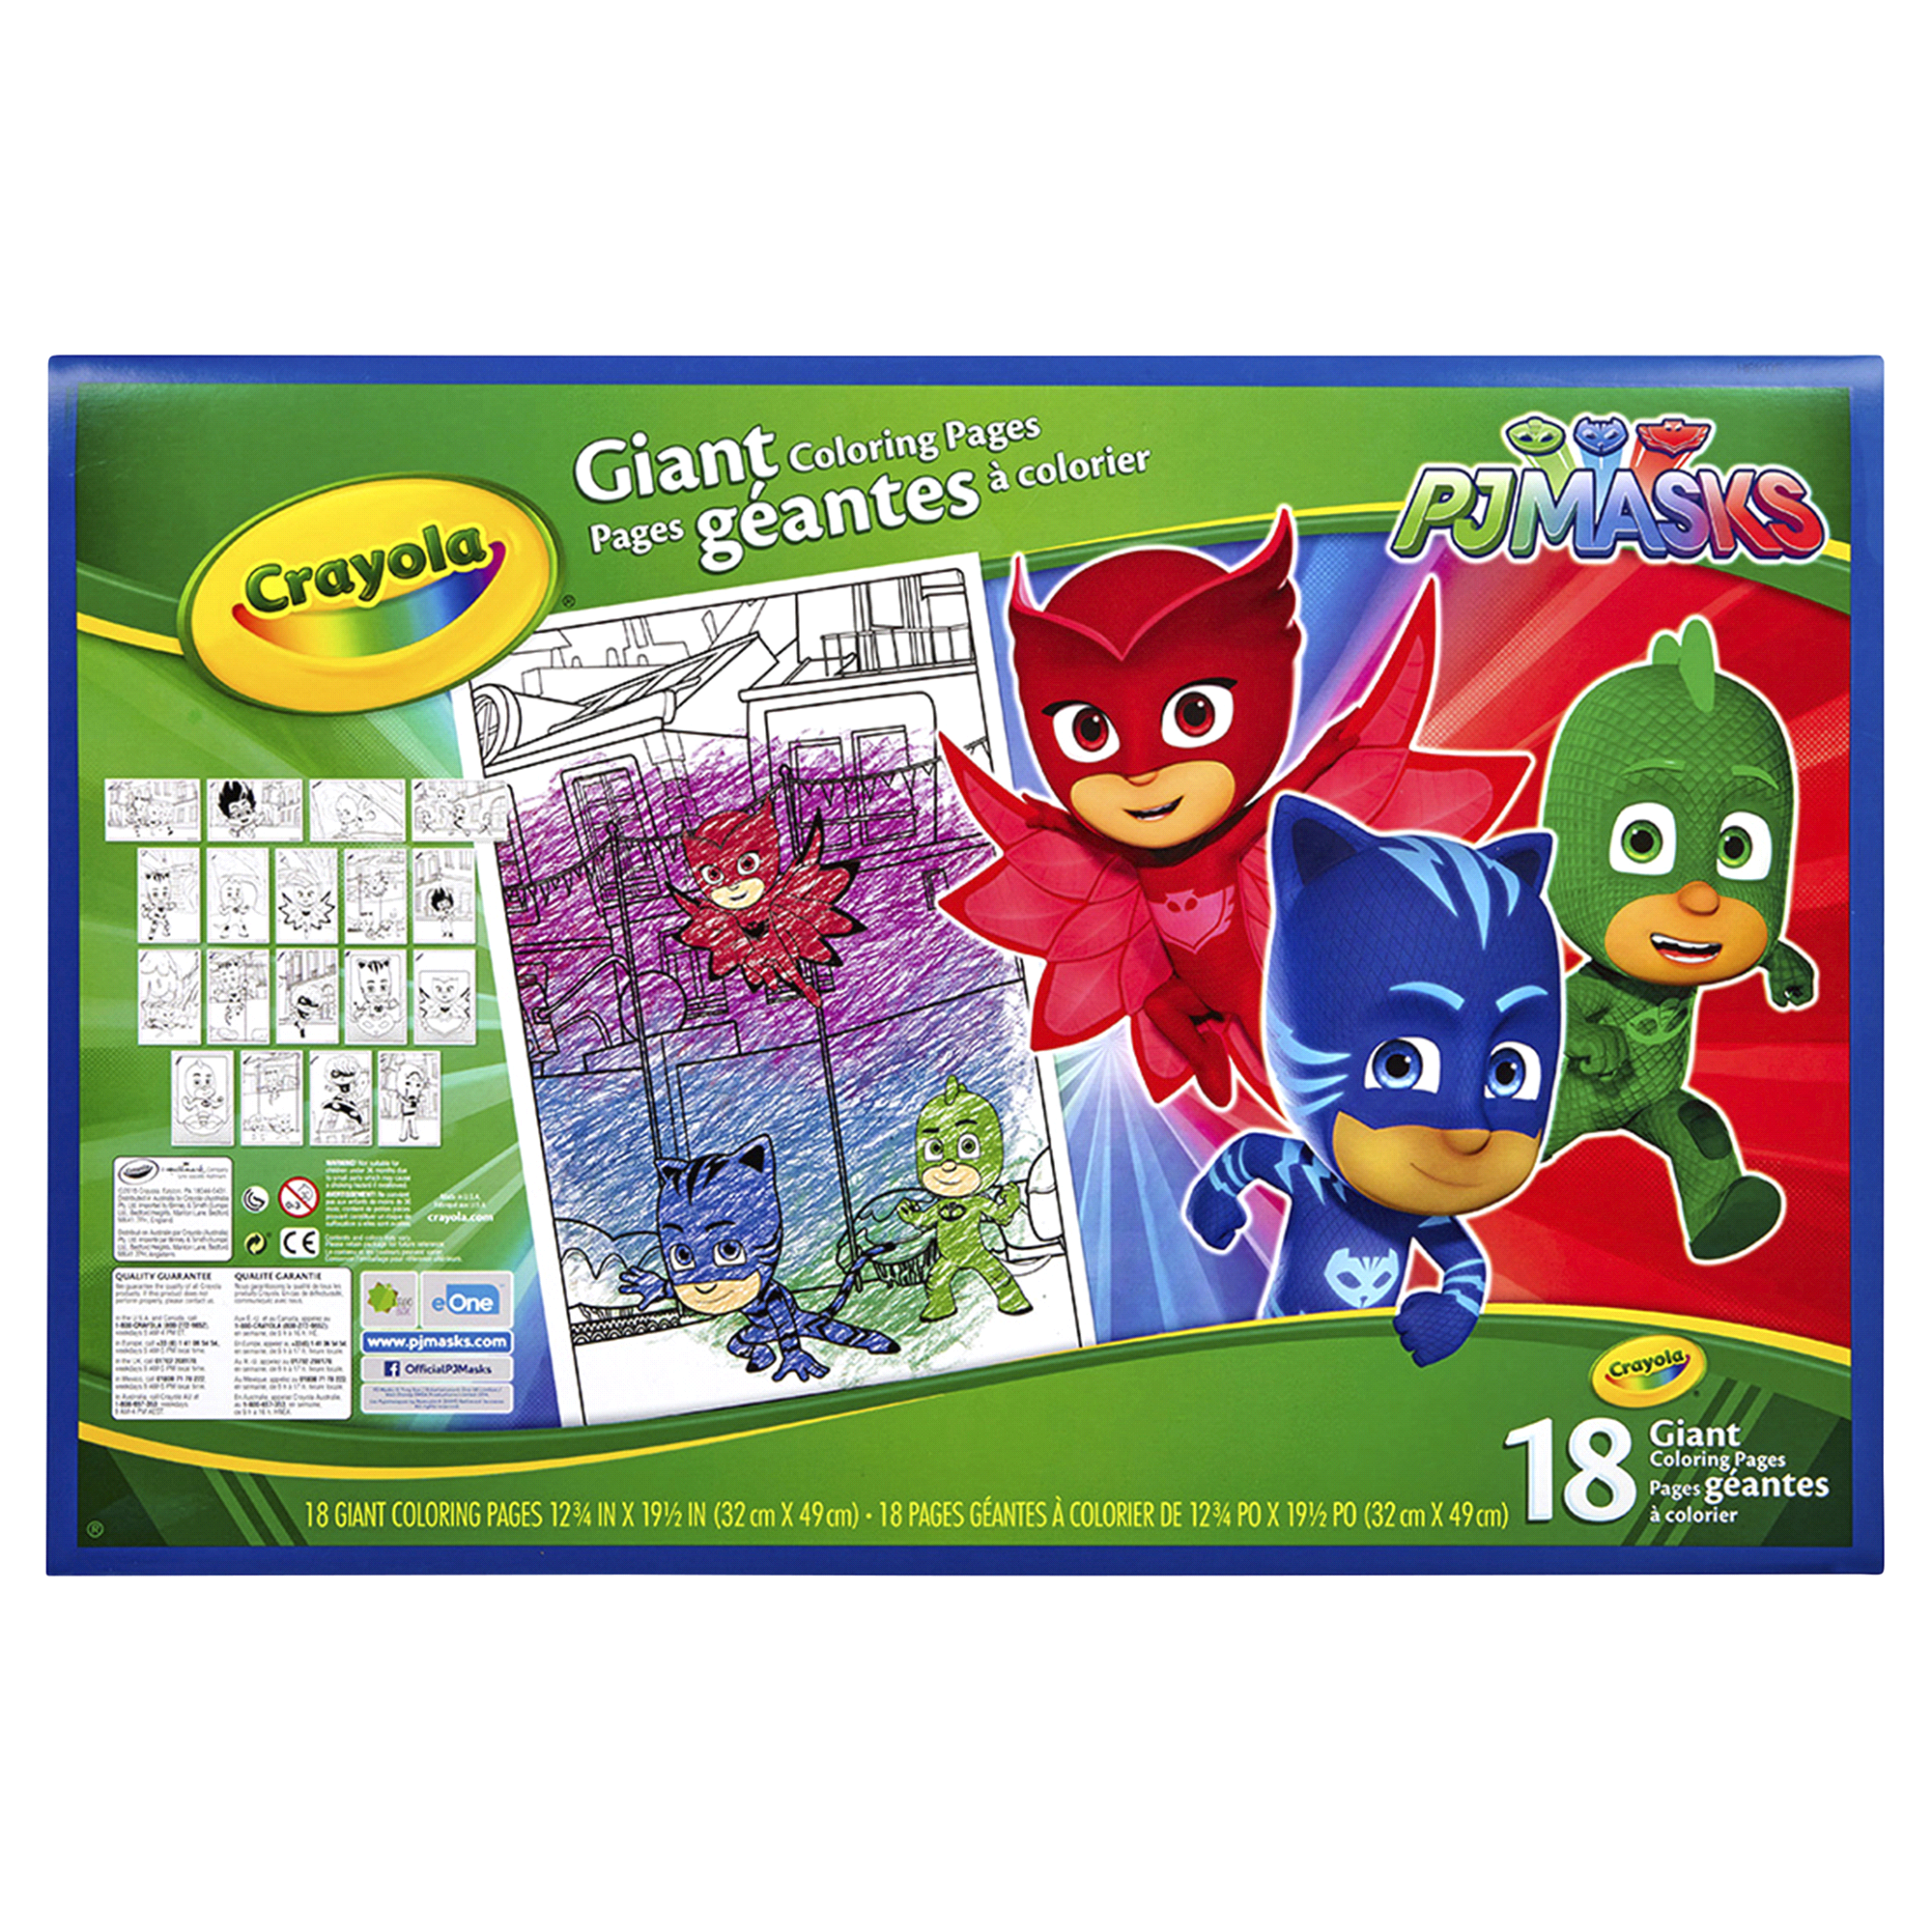 Crayola PJ Masks Giant Coloring Pages | Meijer.com